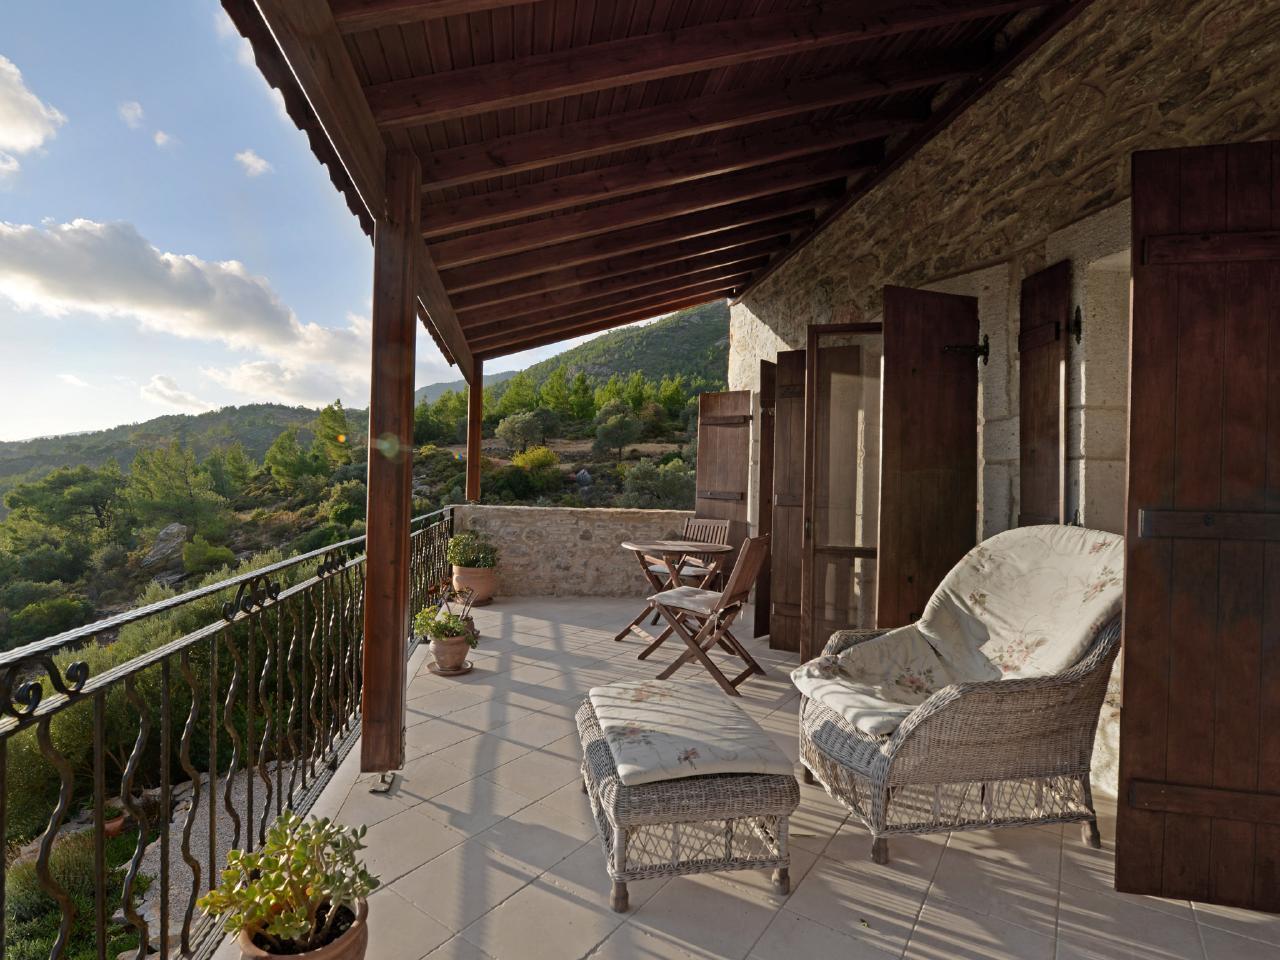 Maison de vacances Exklusives Chalet, romantisch am Berghang und Meer gelegen (2506674), Mesudiye, , Région Egéenne, Turquie, image 15